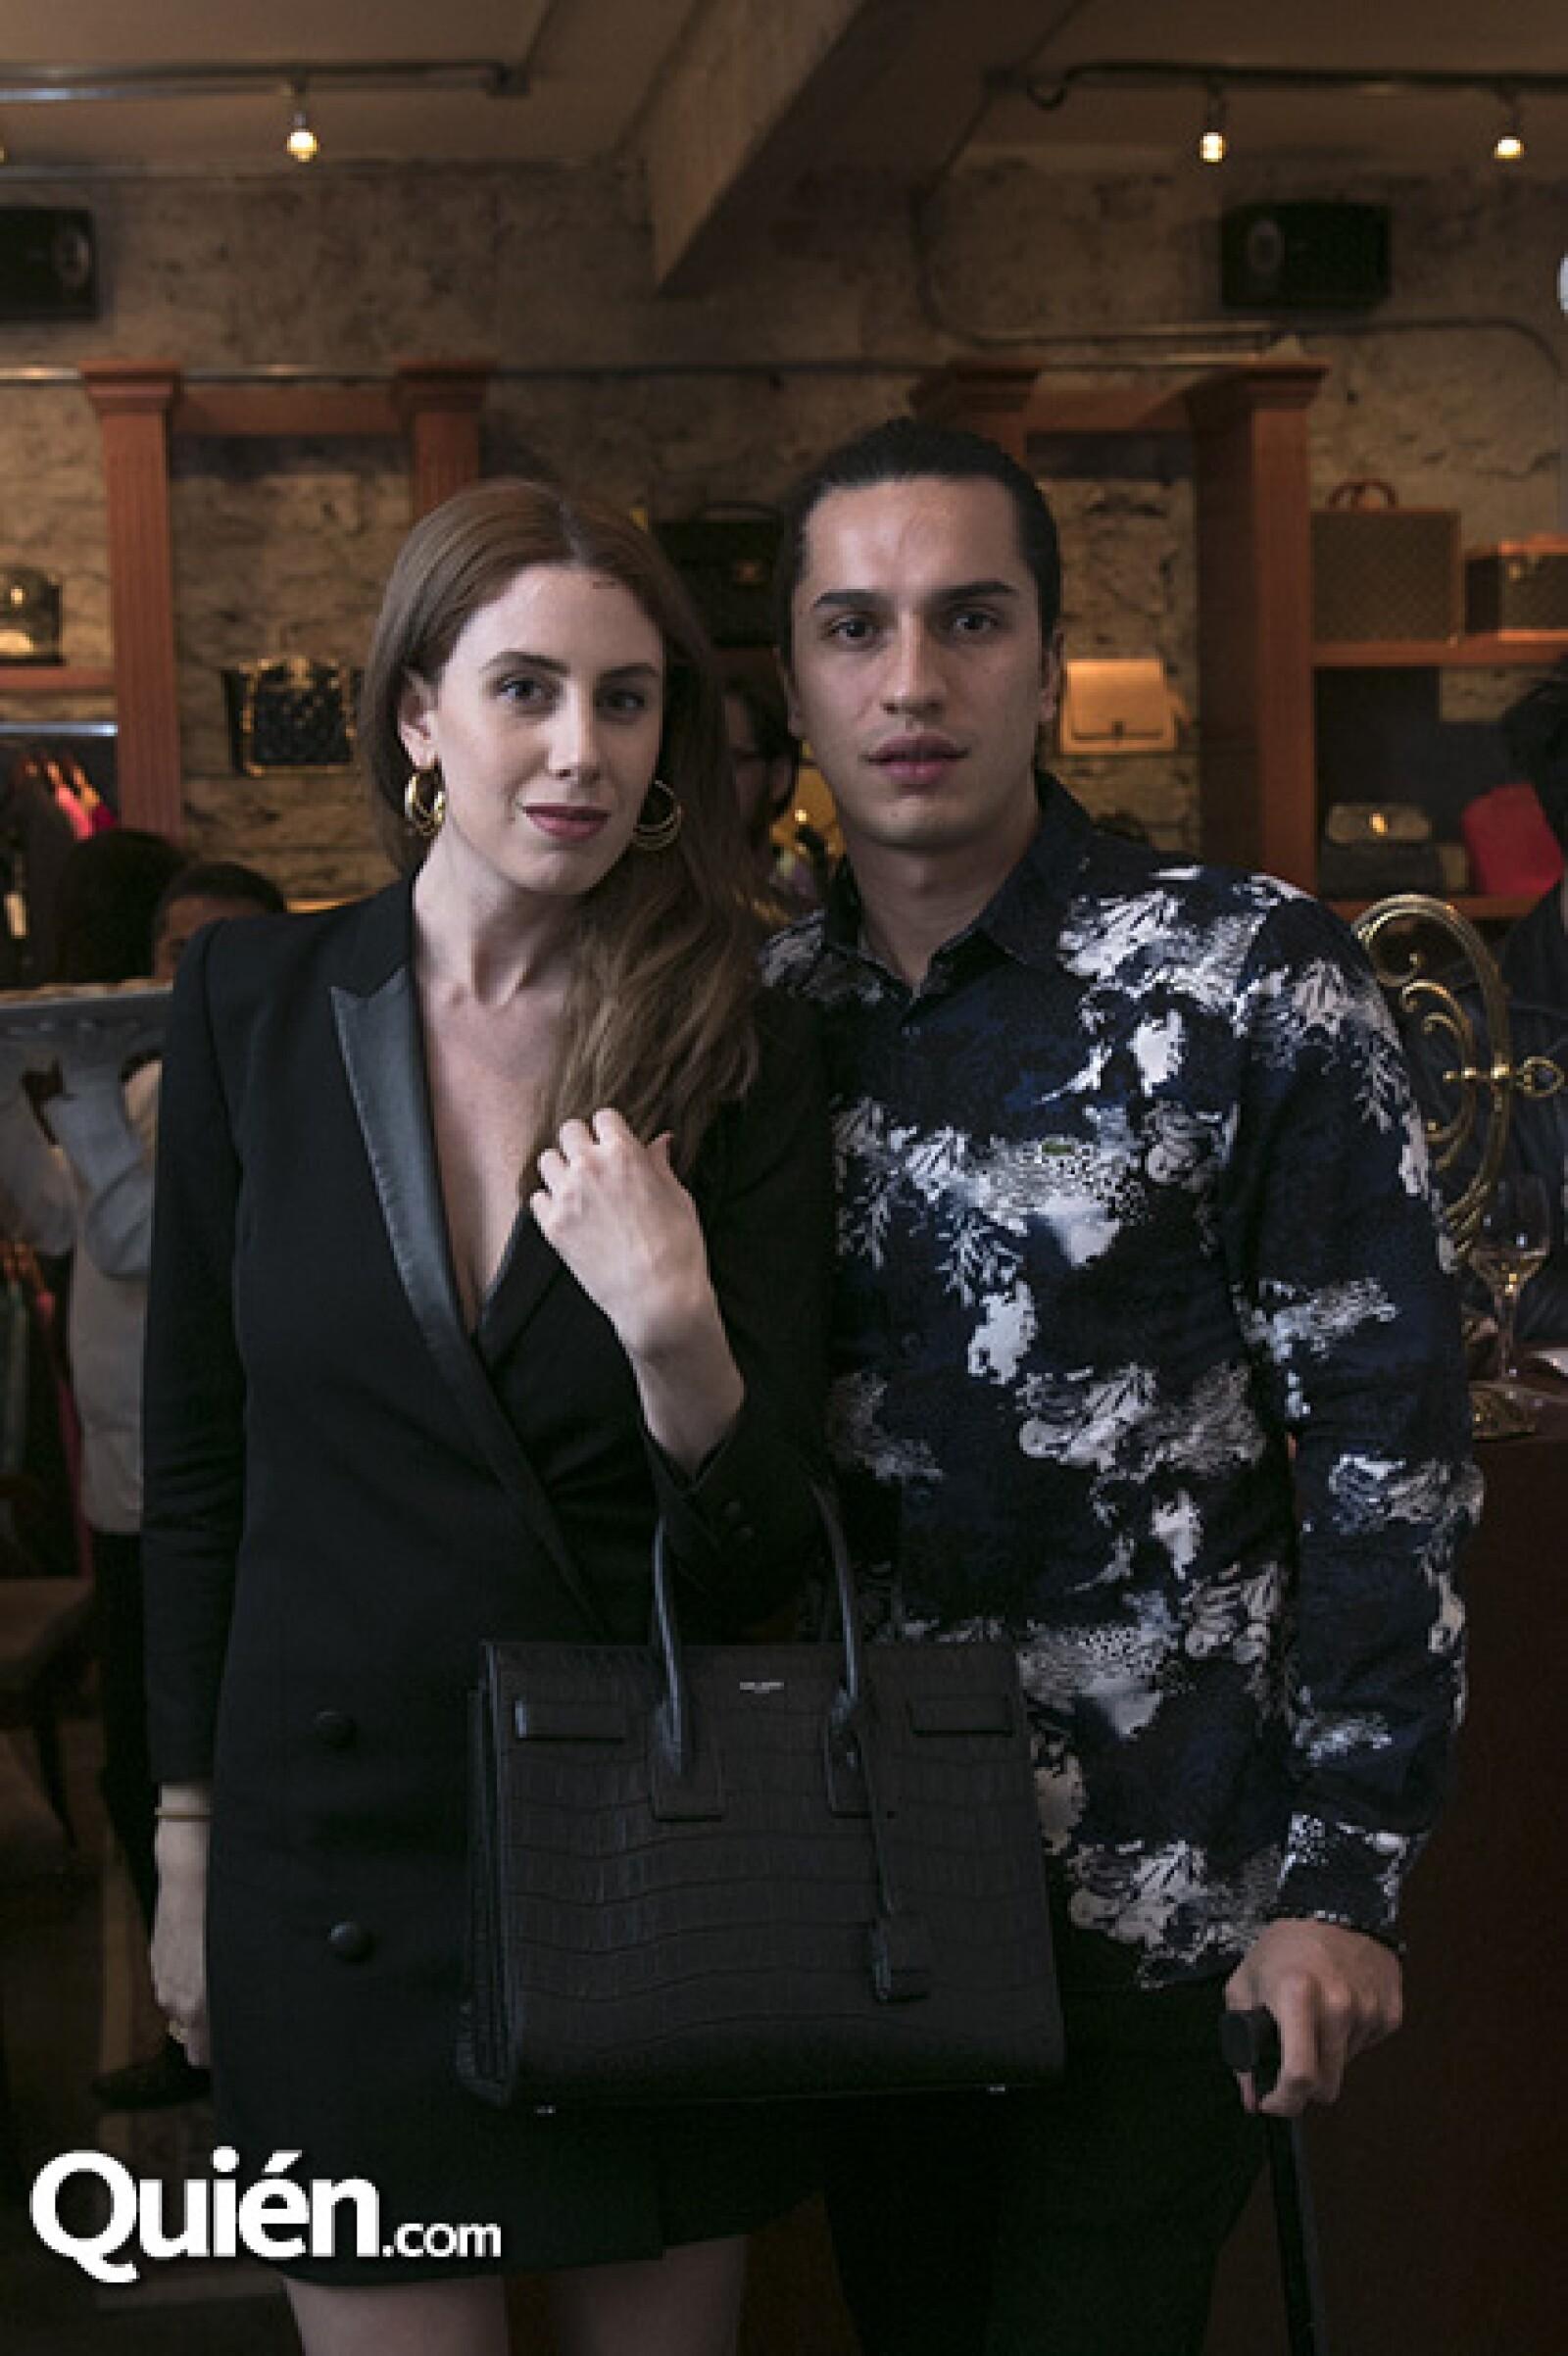 Samantha Calderón y Joe Guiness